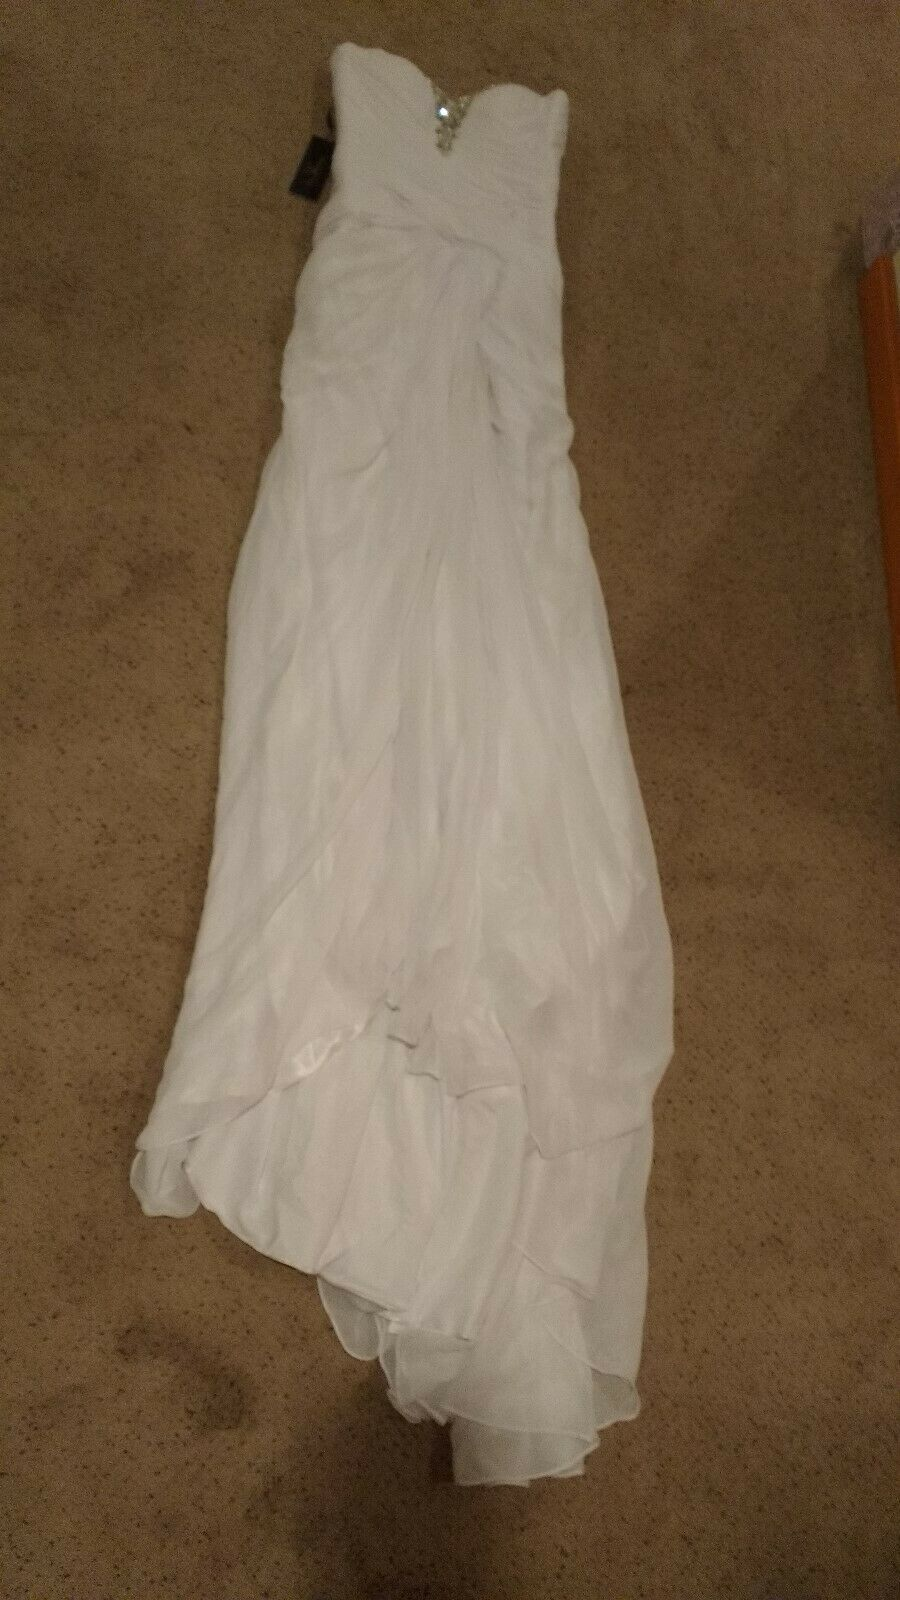 *NEW* Bailey Bridal Strapless Rhinestone Satin Chiffon Custom Wedding Dress